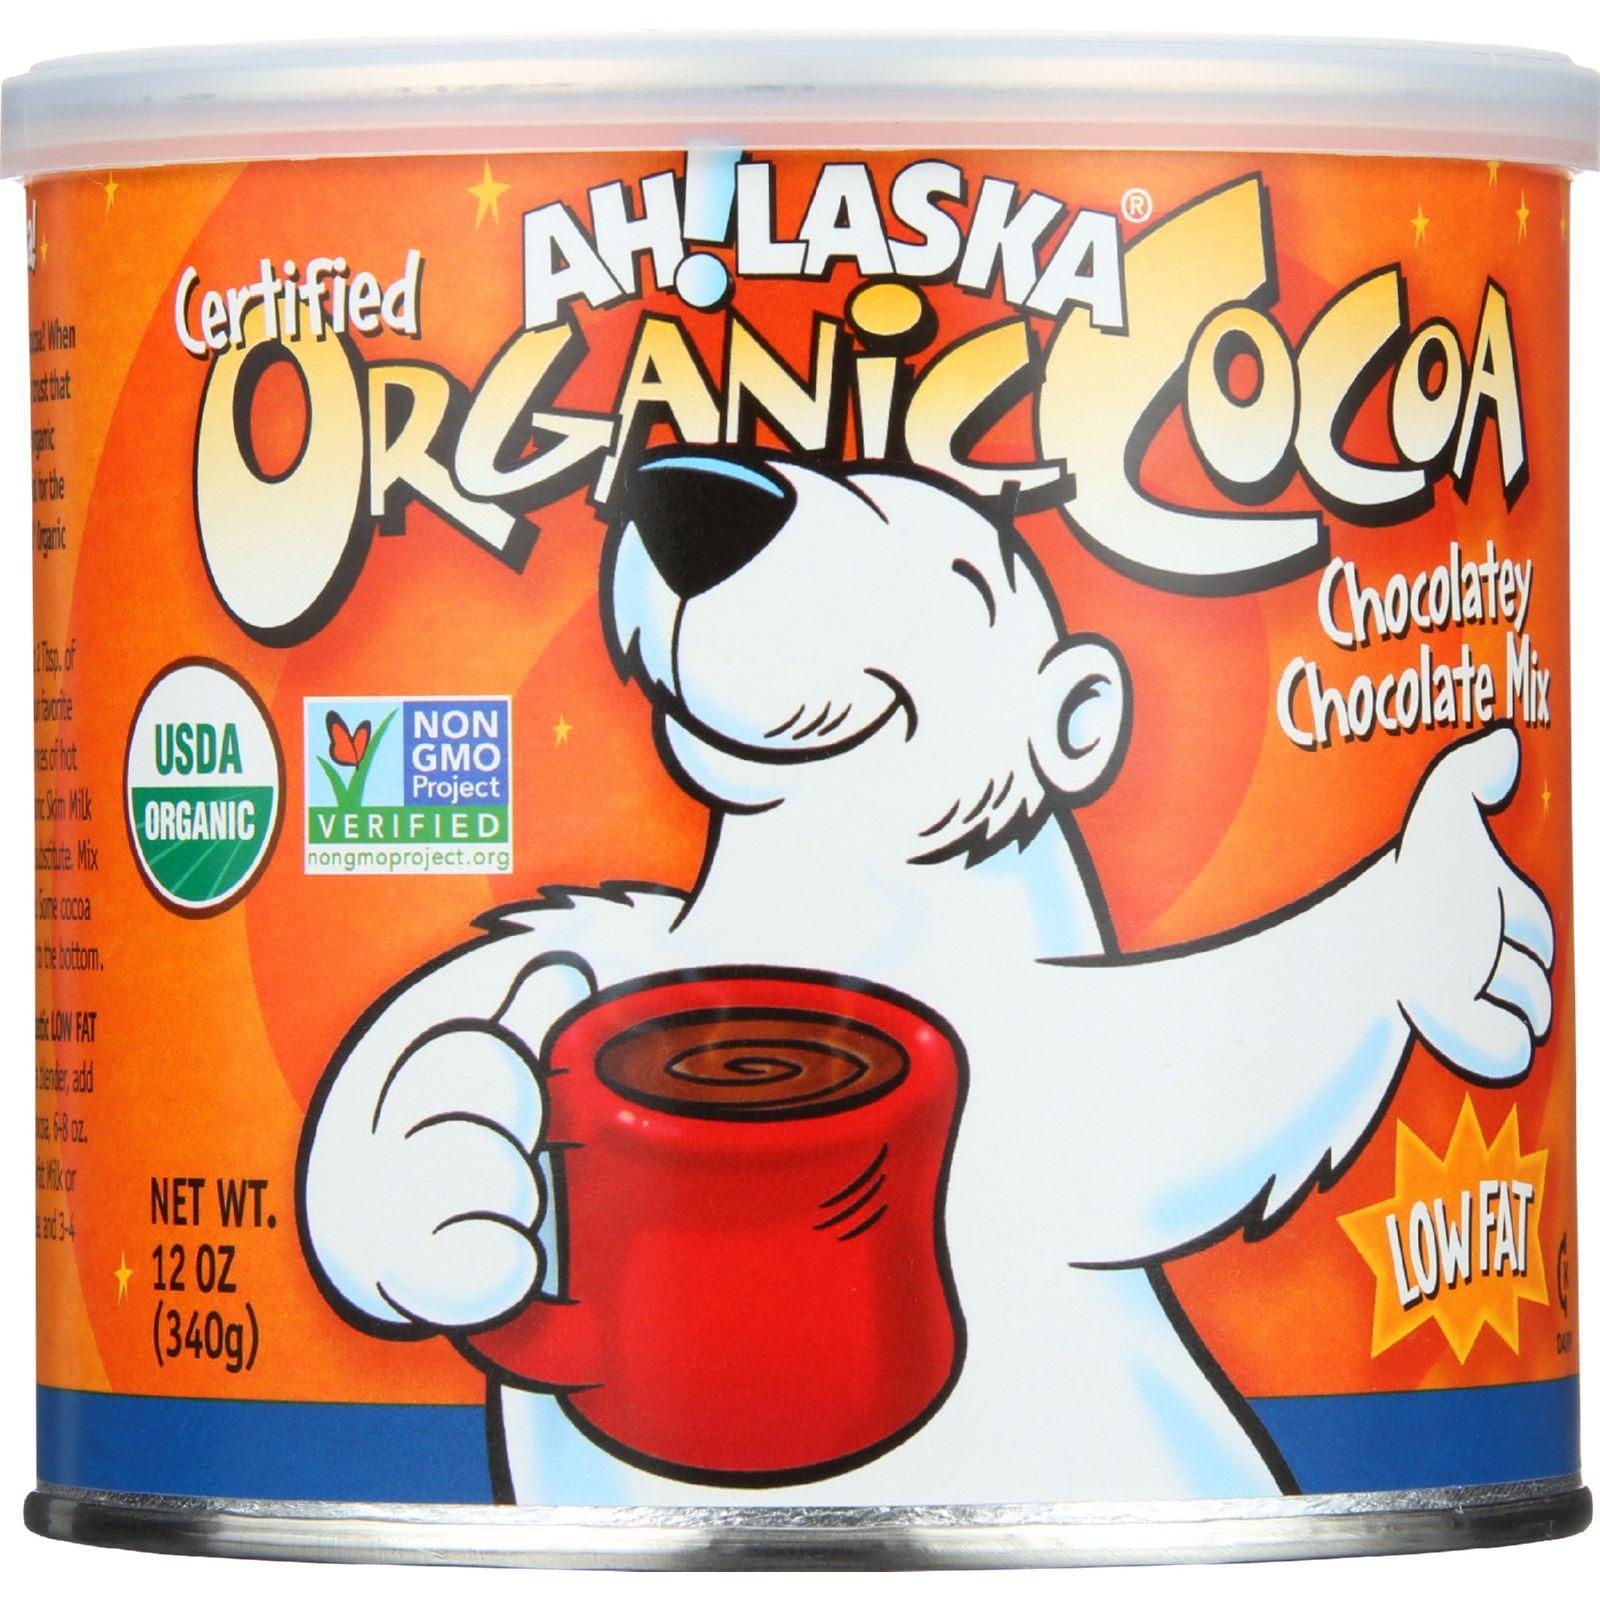 AhLaska Cocoa Mix - Organic - Chocolatey Chocolate - Low Fat - 12 oz - case of 12